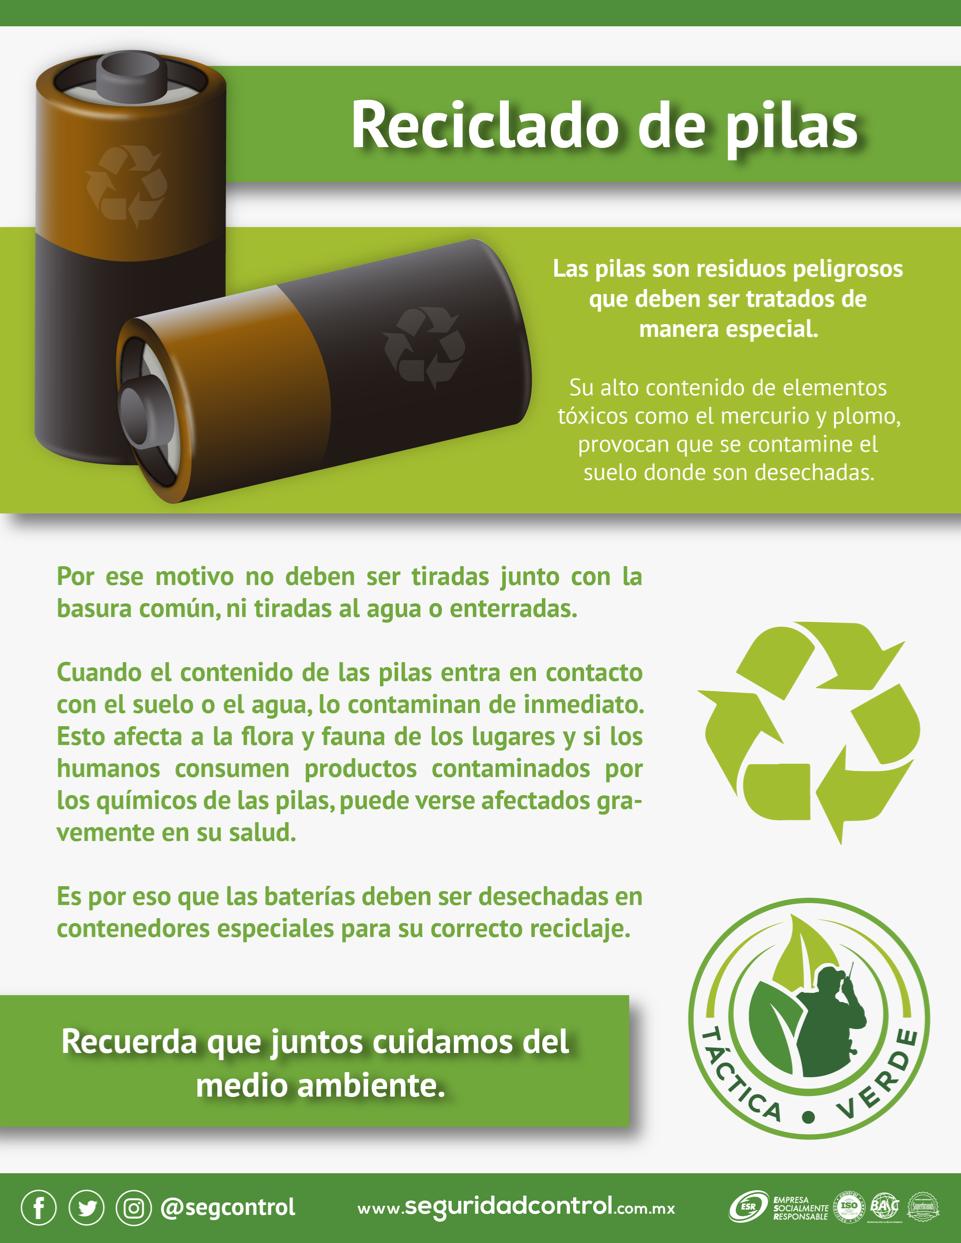 Reciclado De Pilas Reciclar Pilas Reciclado Reciclar